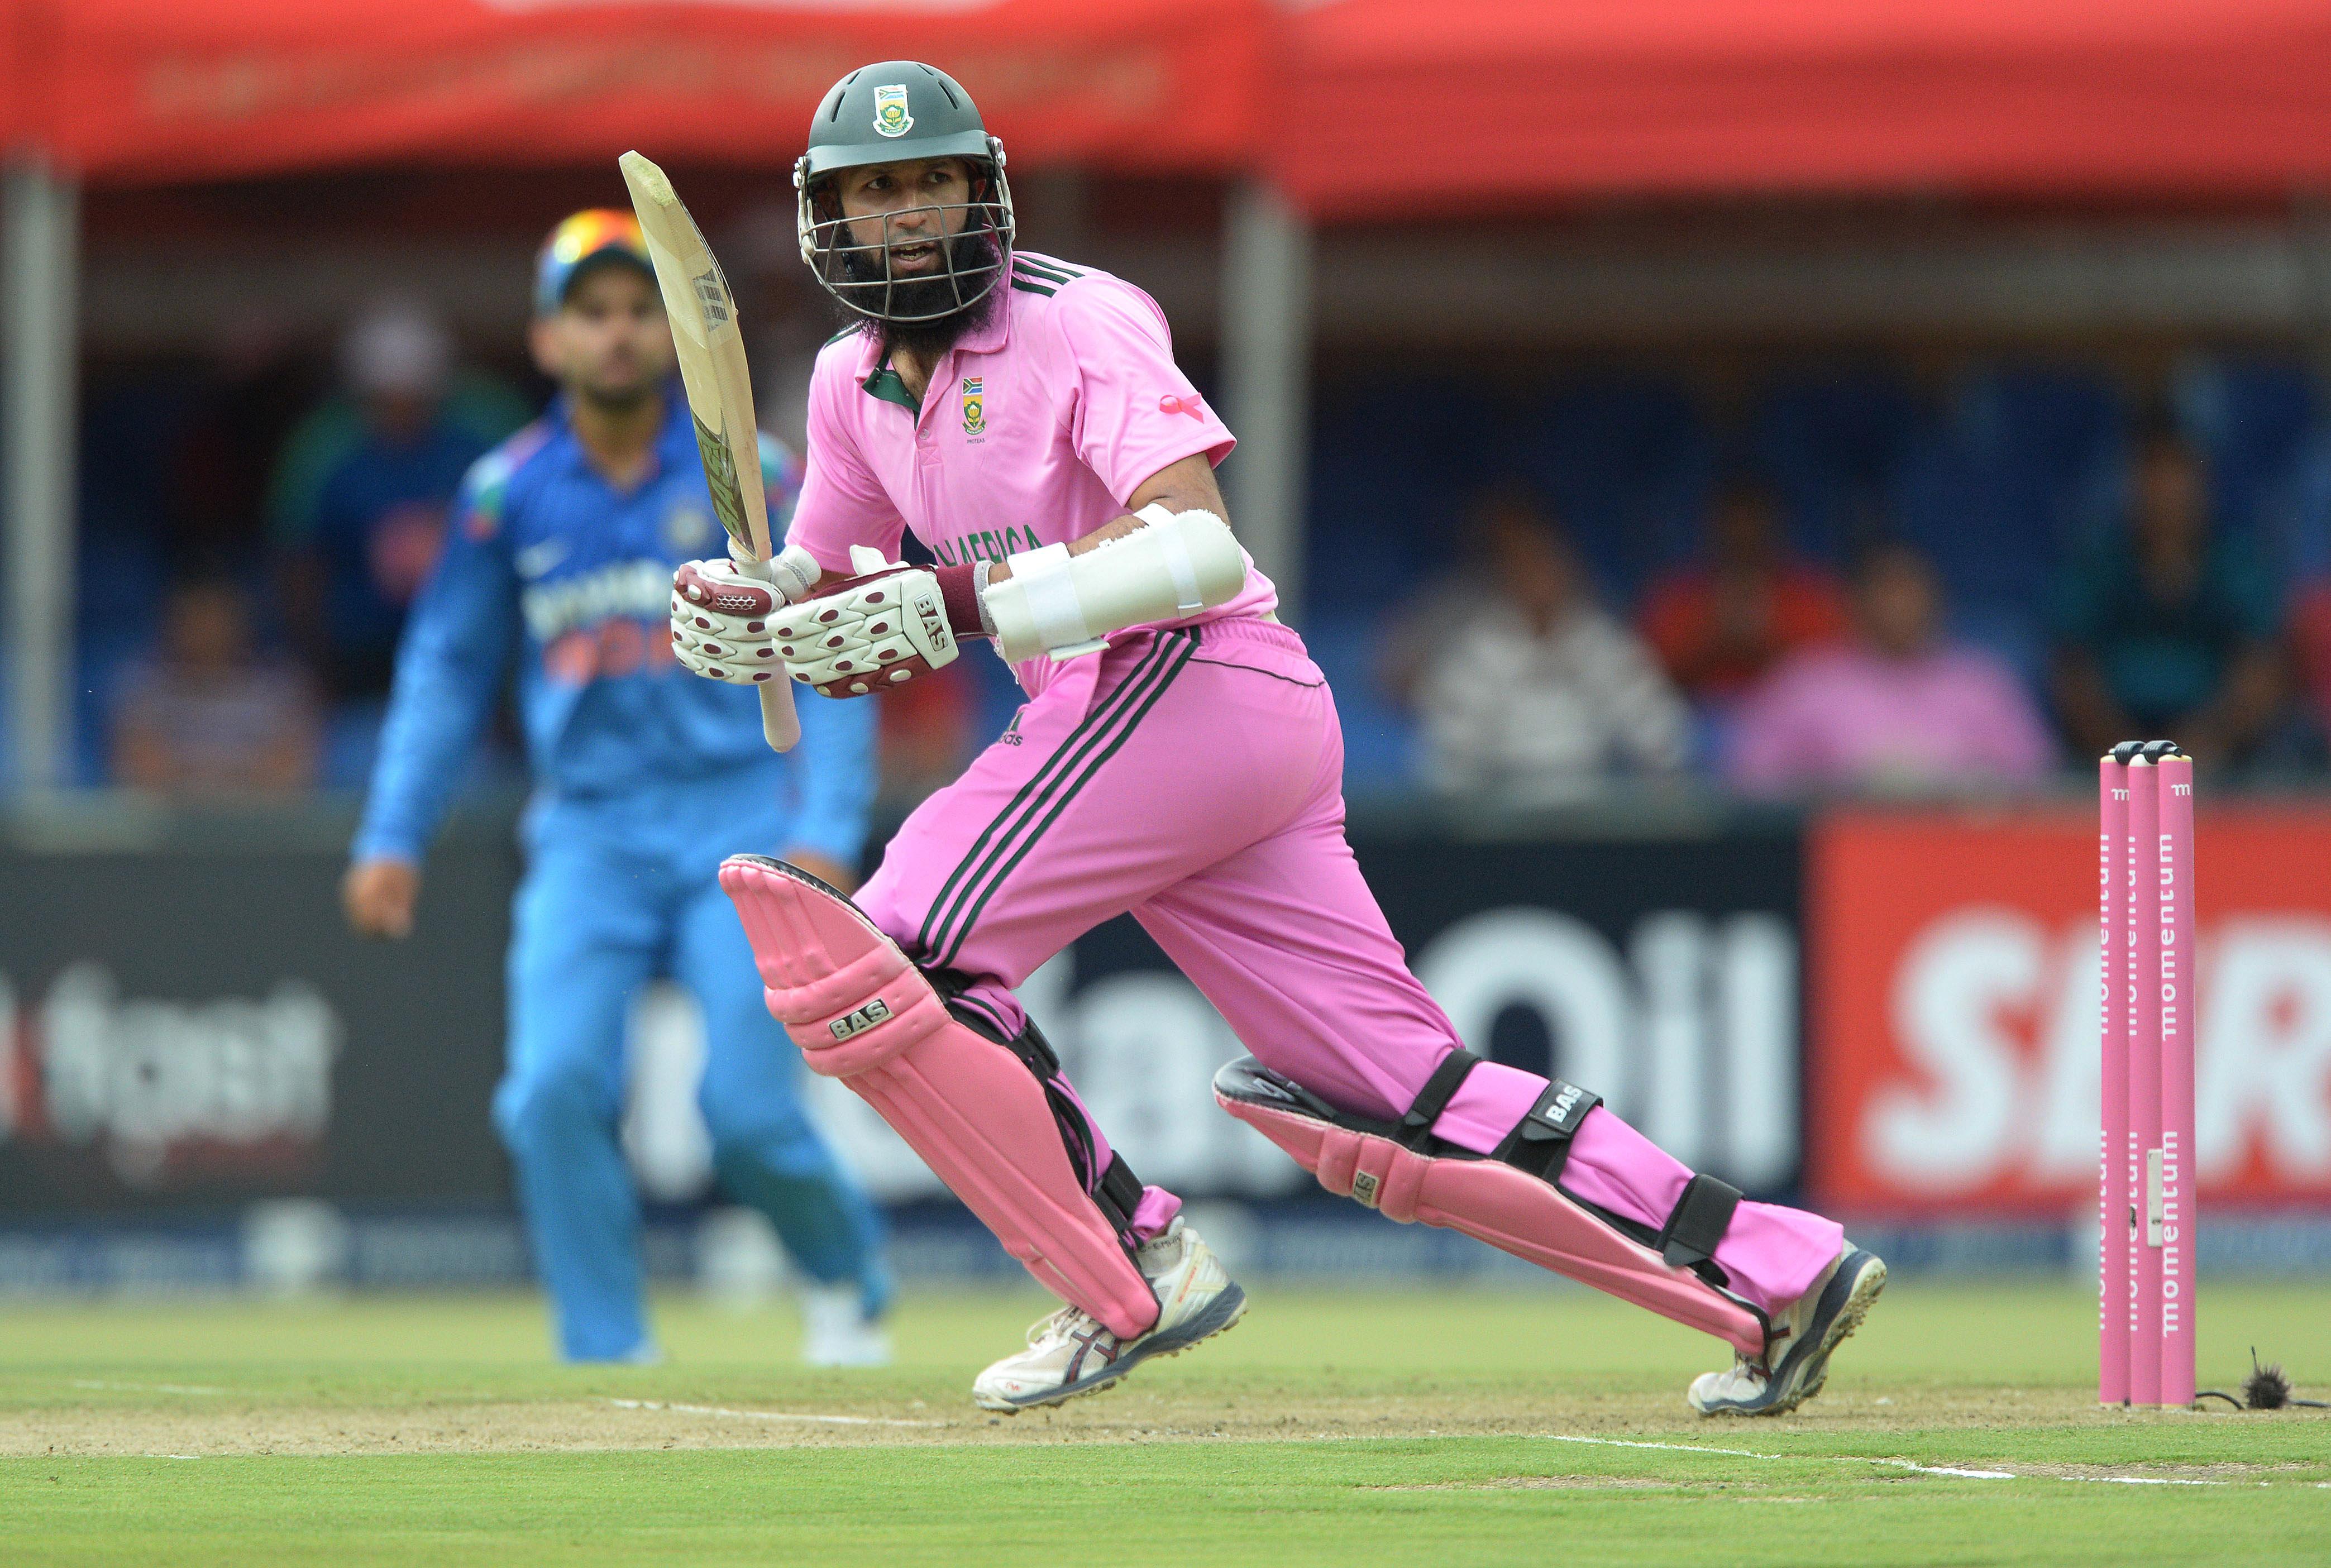 South Africa v India - First ODI